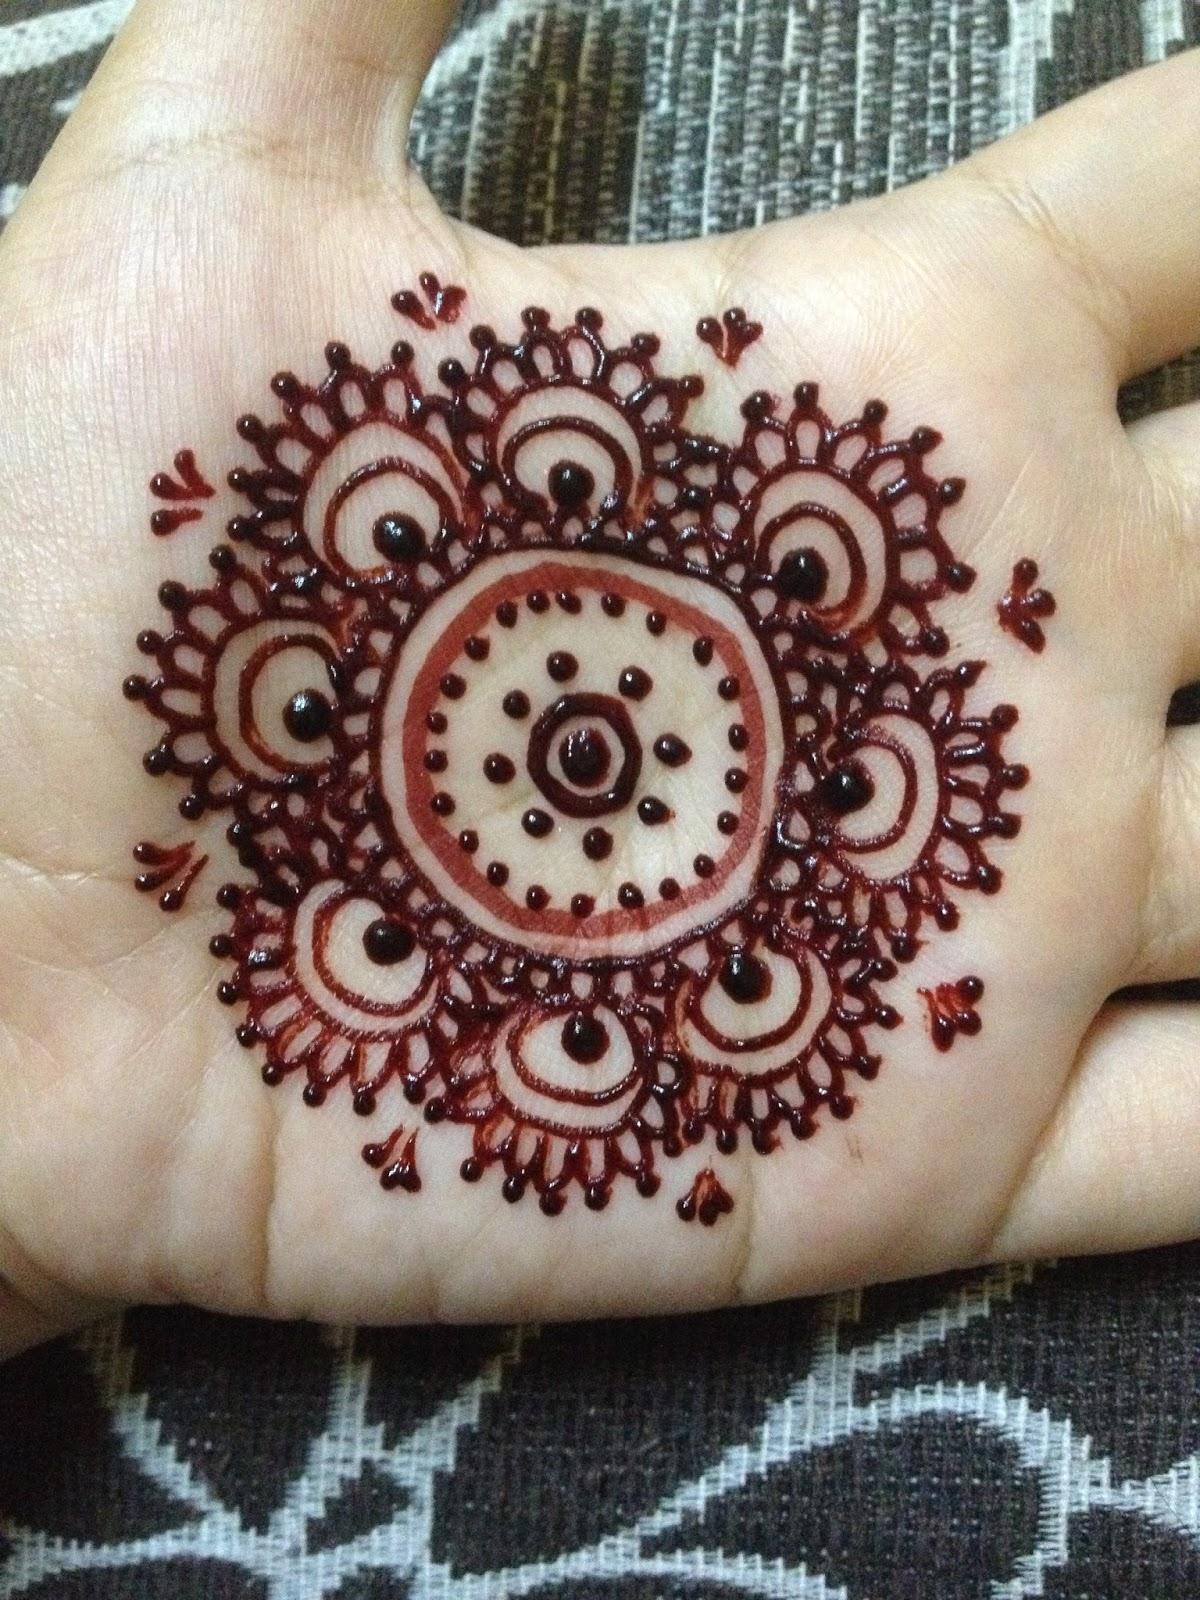 Contoh Henna Simple Di Telapak Tangan Materi Pelajaran 10